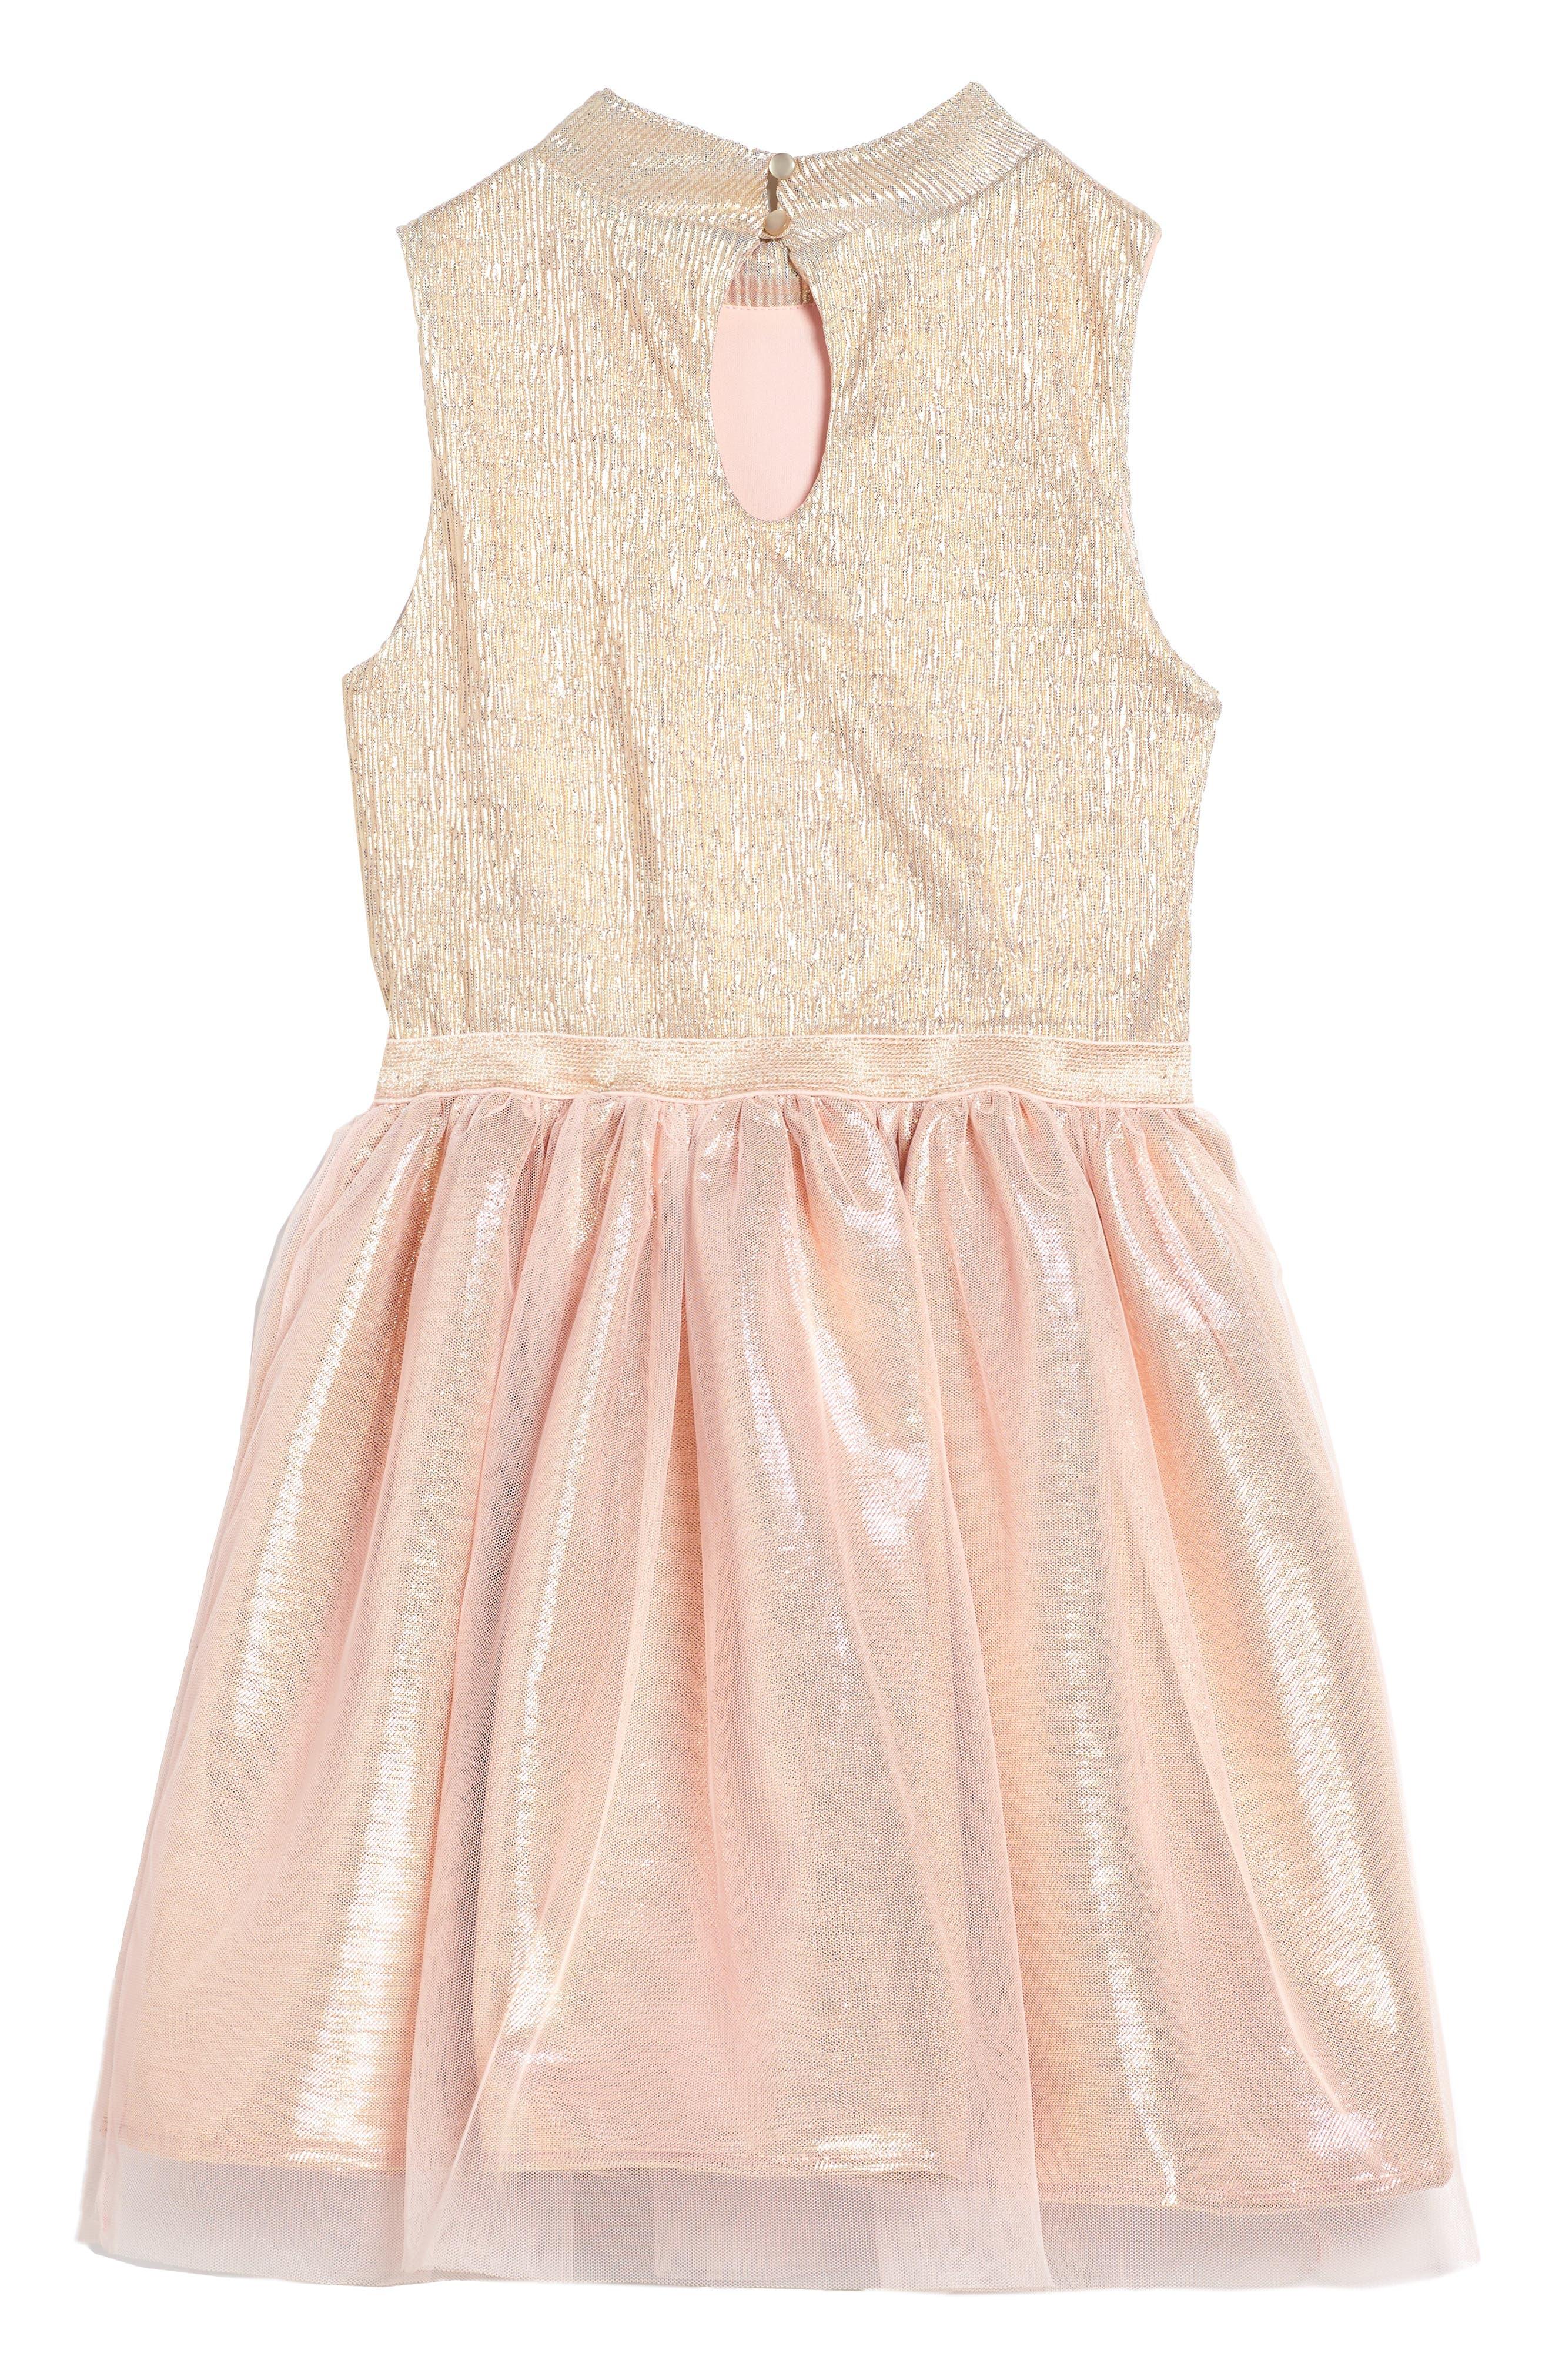 Alternate Image 2  - Zunie Metallic Shimmer Mock Neck Dress (Big Girls)